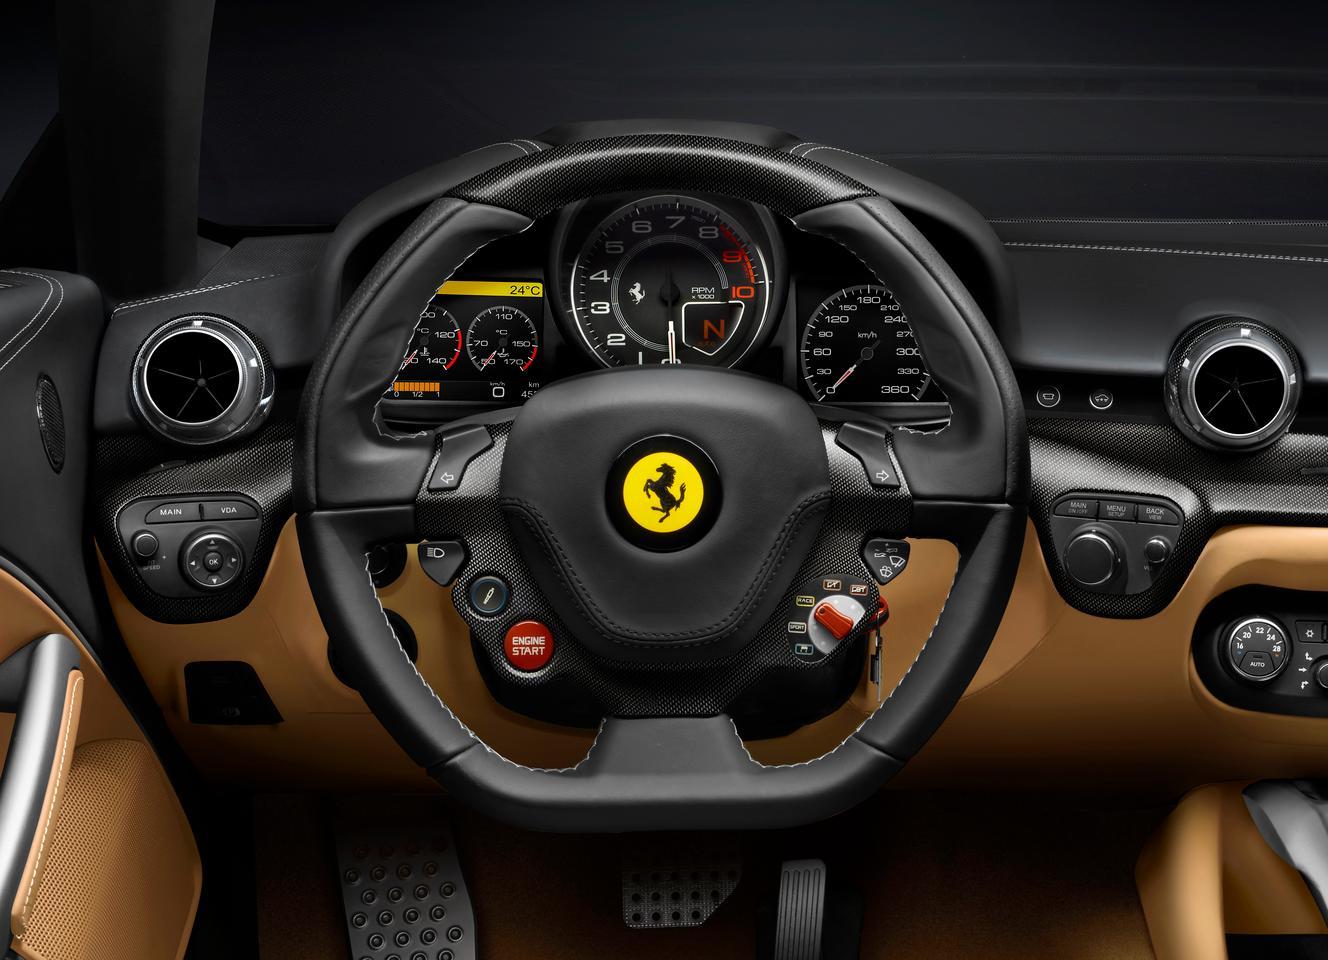 Inside the new Ferrari F12berlinetta